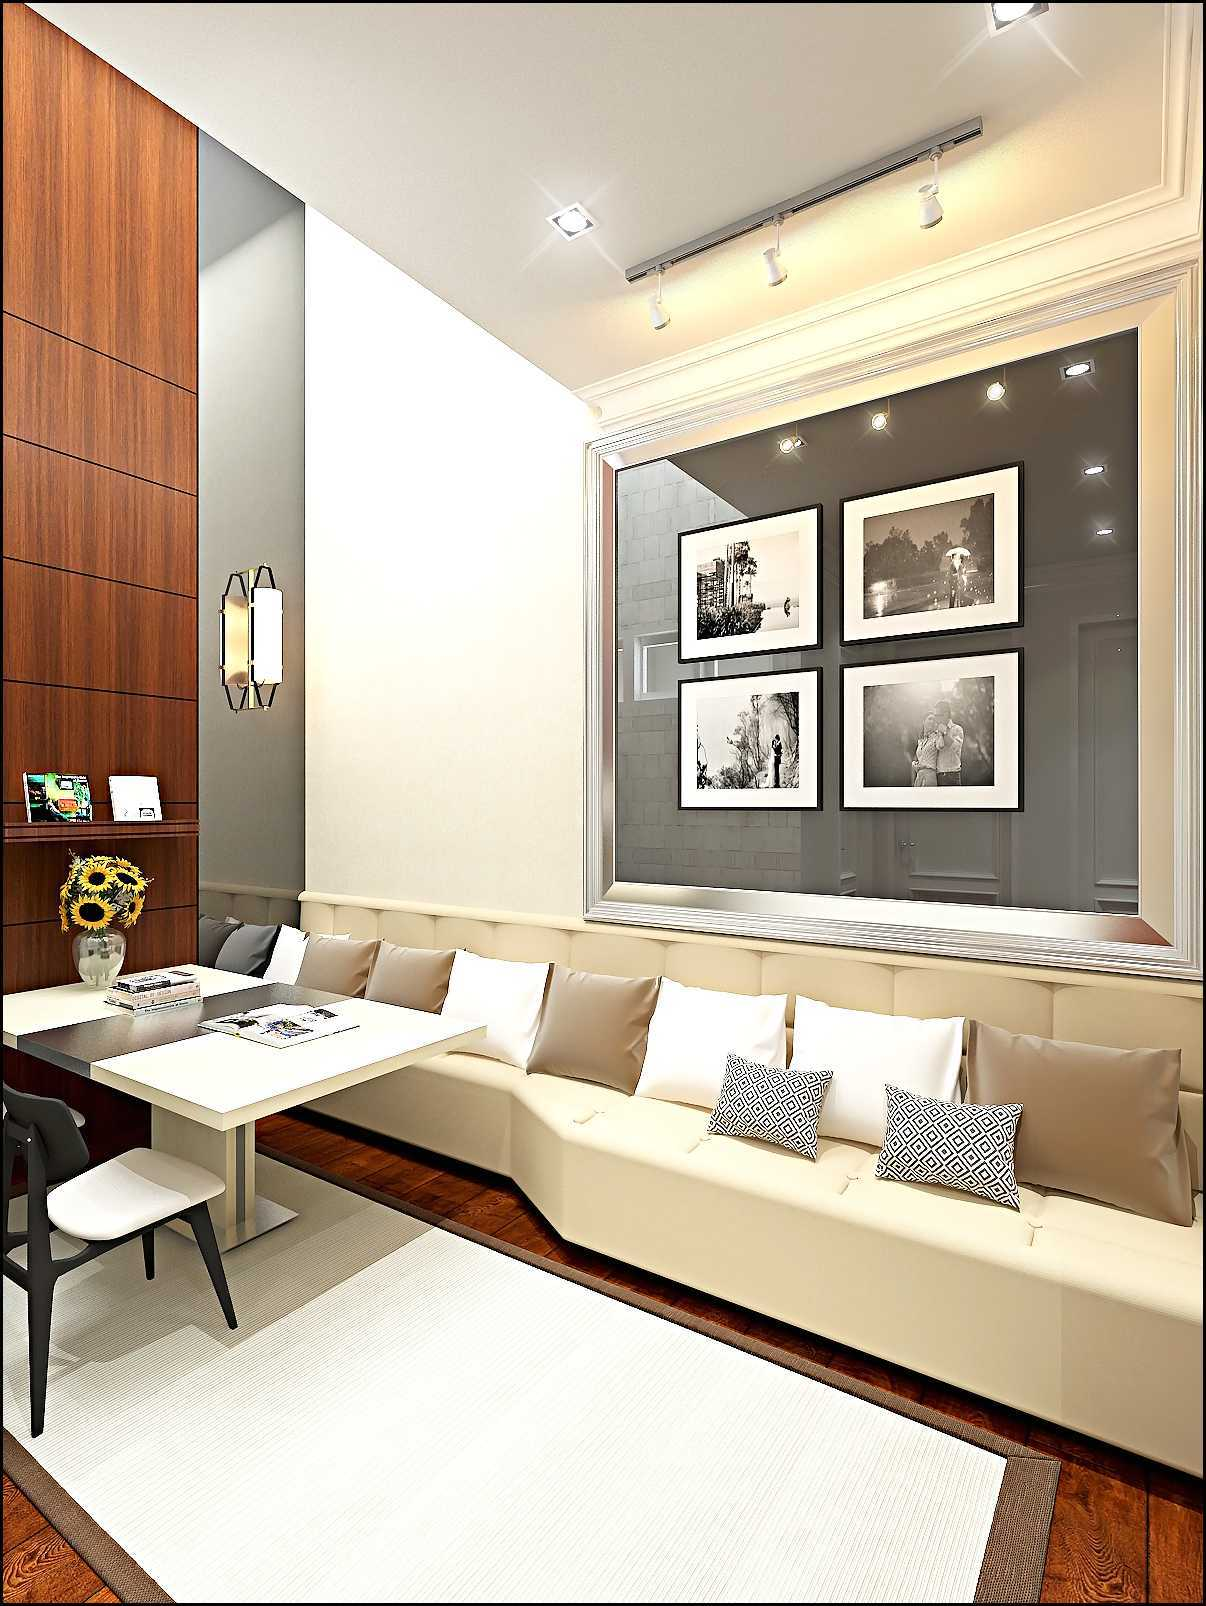 Emilia Oei Greenlake Sunter Jakarta, Indonesia Jakarta, Indonesia Seating Area   9746